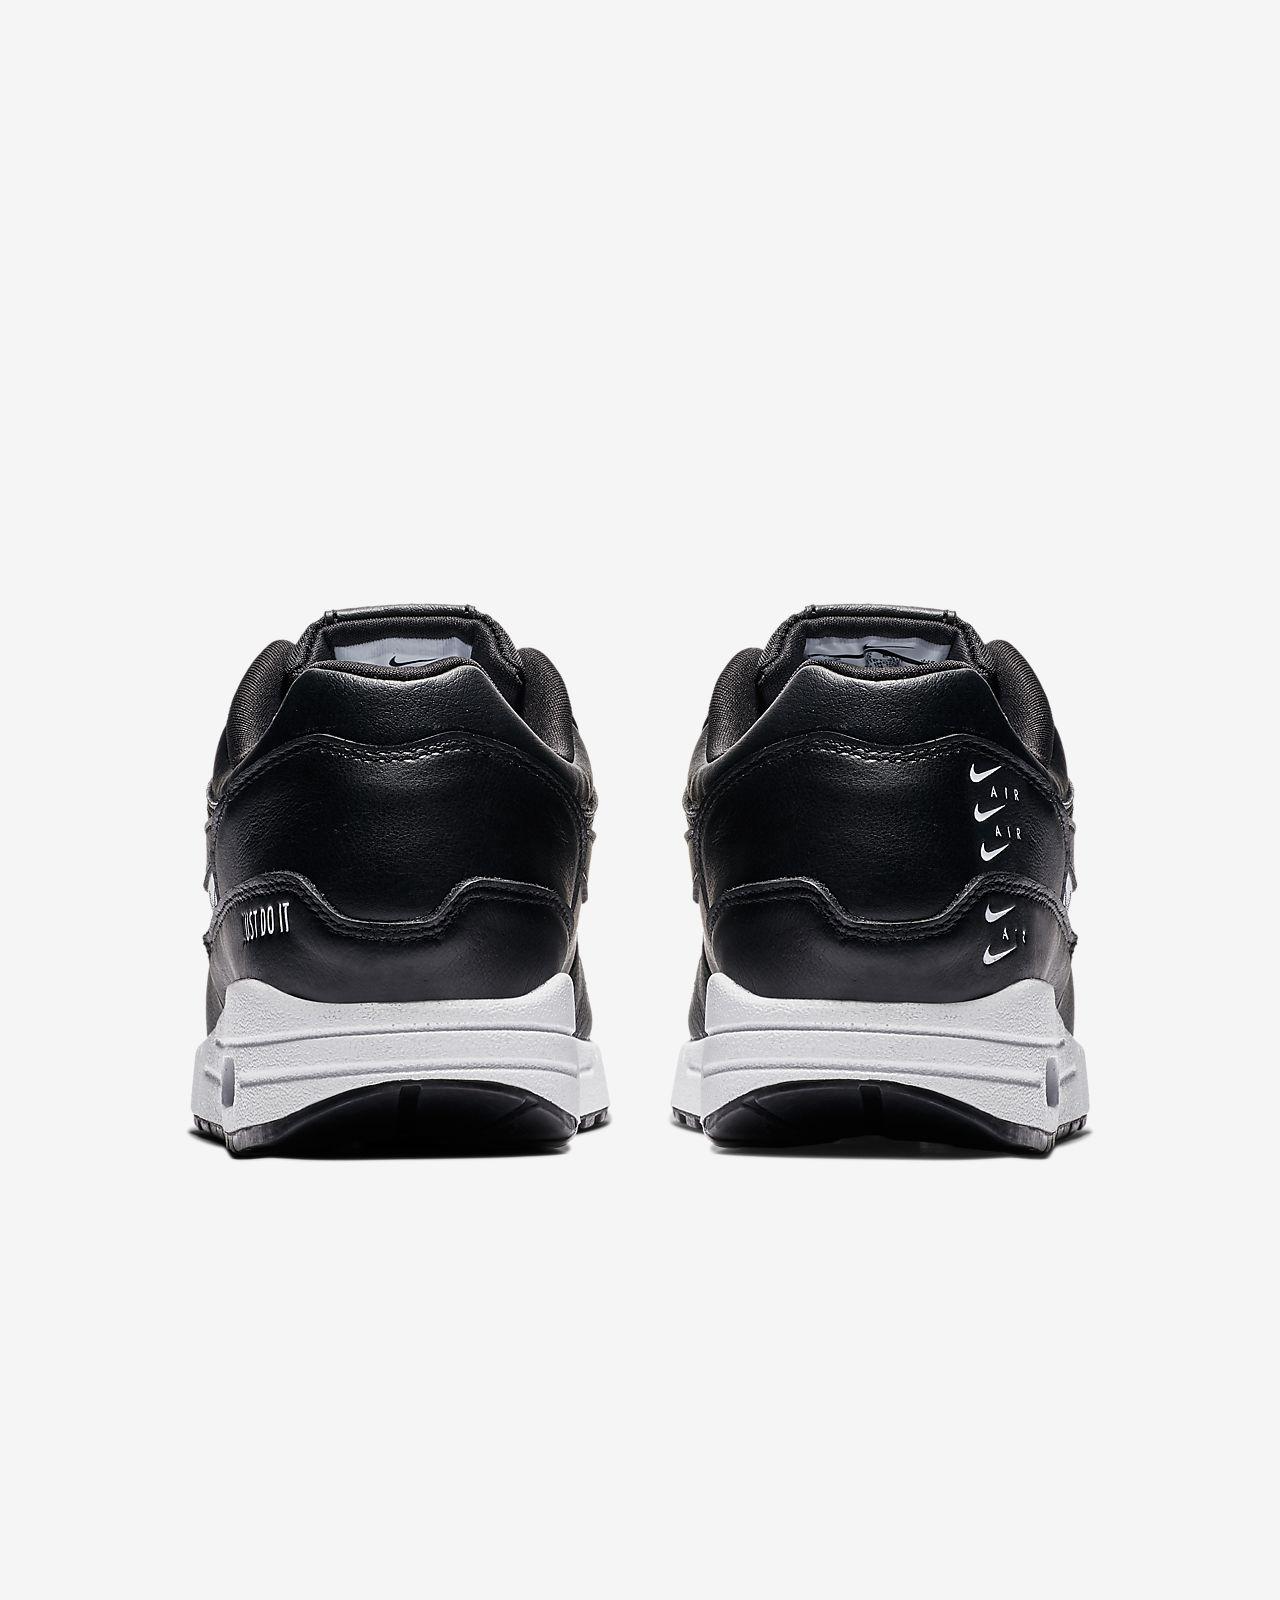 ba930c4cc9 Nike Air Max 1 SE Women's Shoe. Nike.com BE